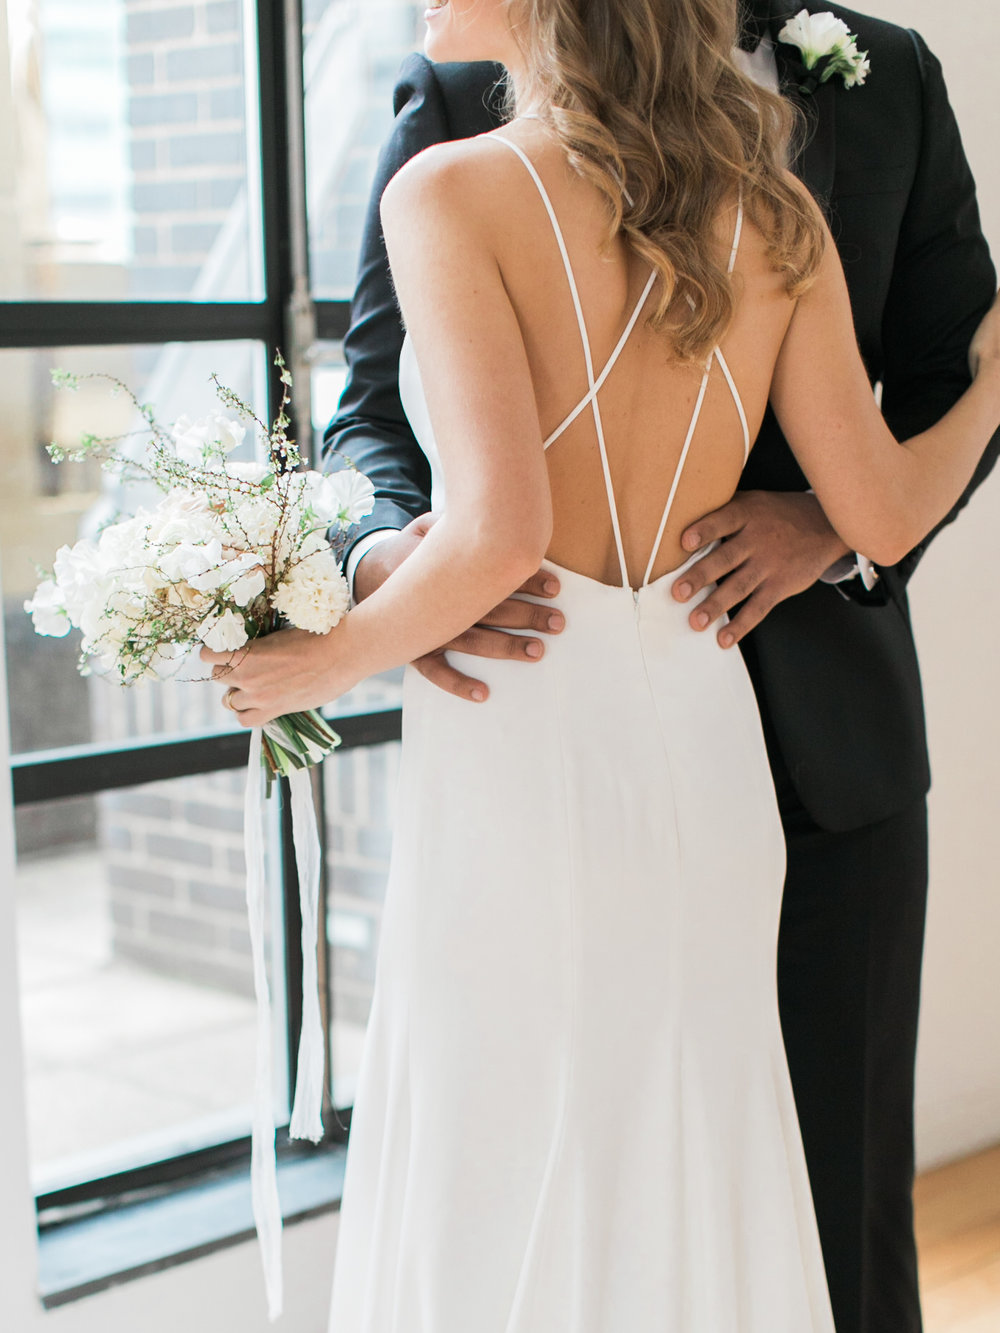 asher-gardner-photography-bryant-park-wedding-00249.jpg